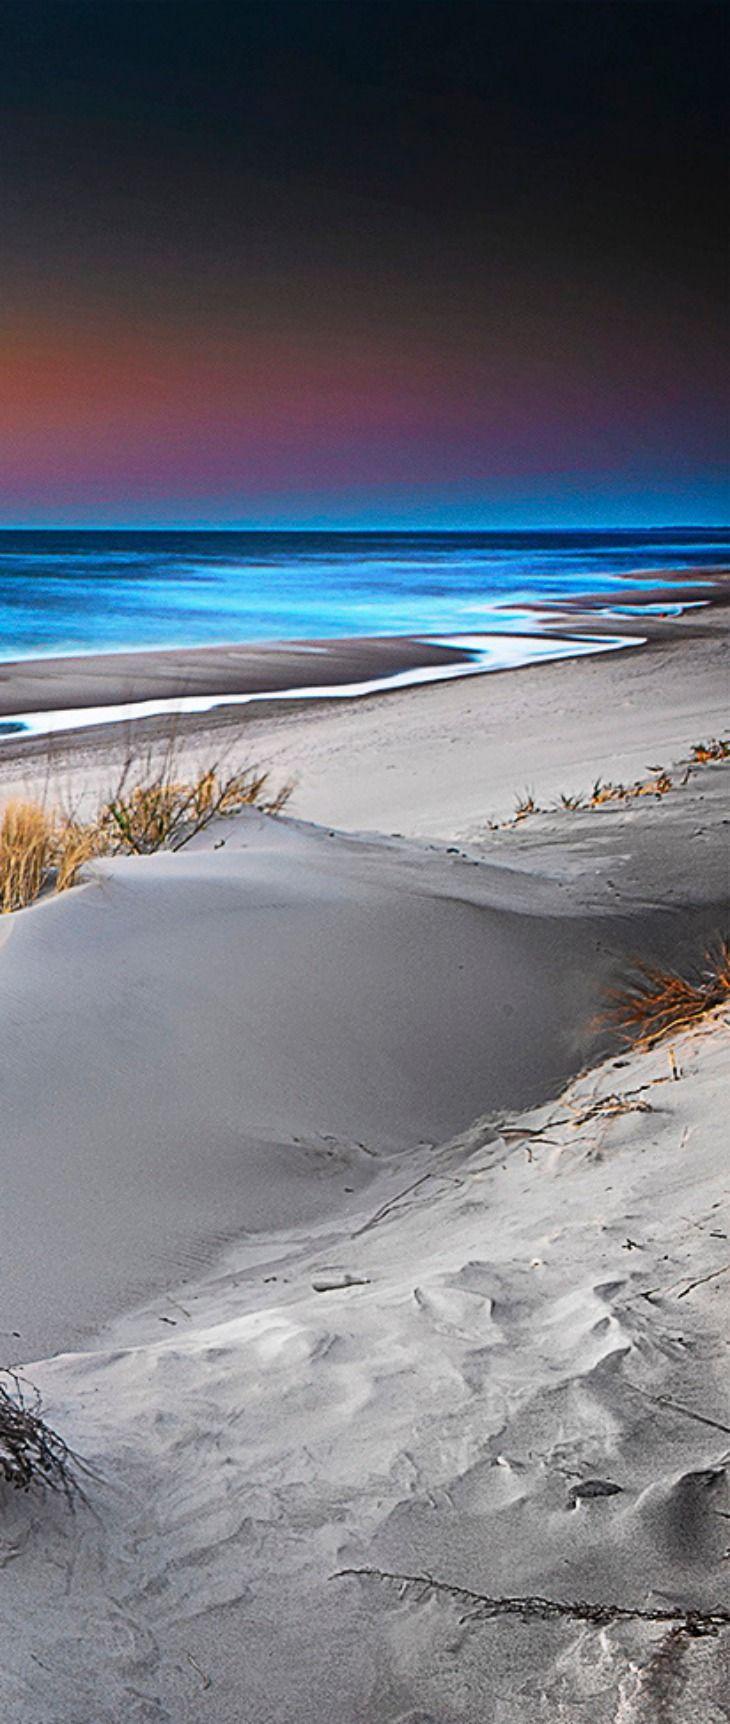 Baltic Sea, Poland | by Michal Mierzehewski on 500px // Premium